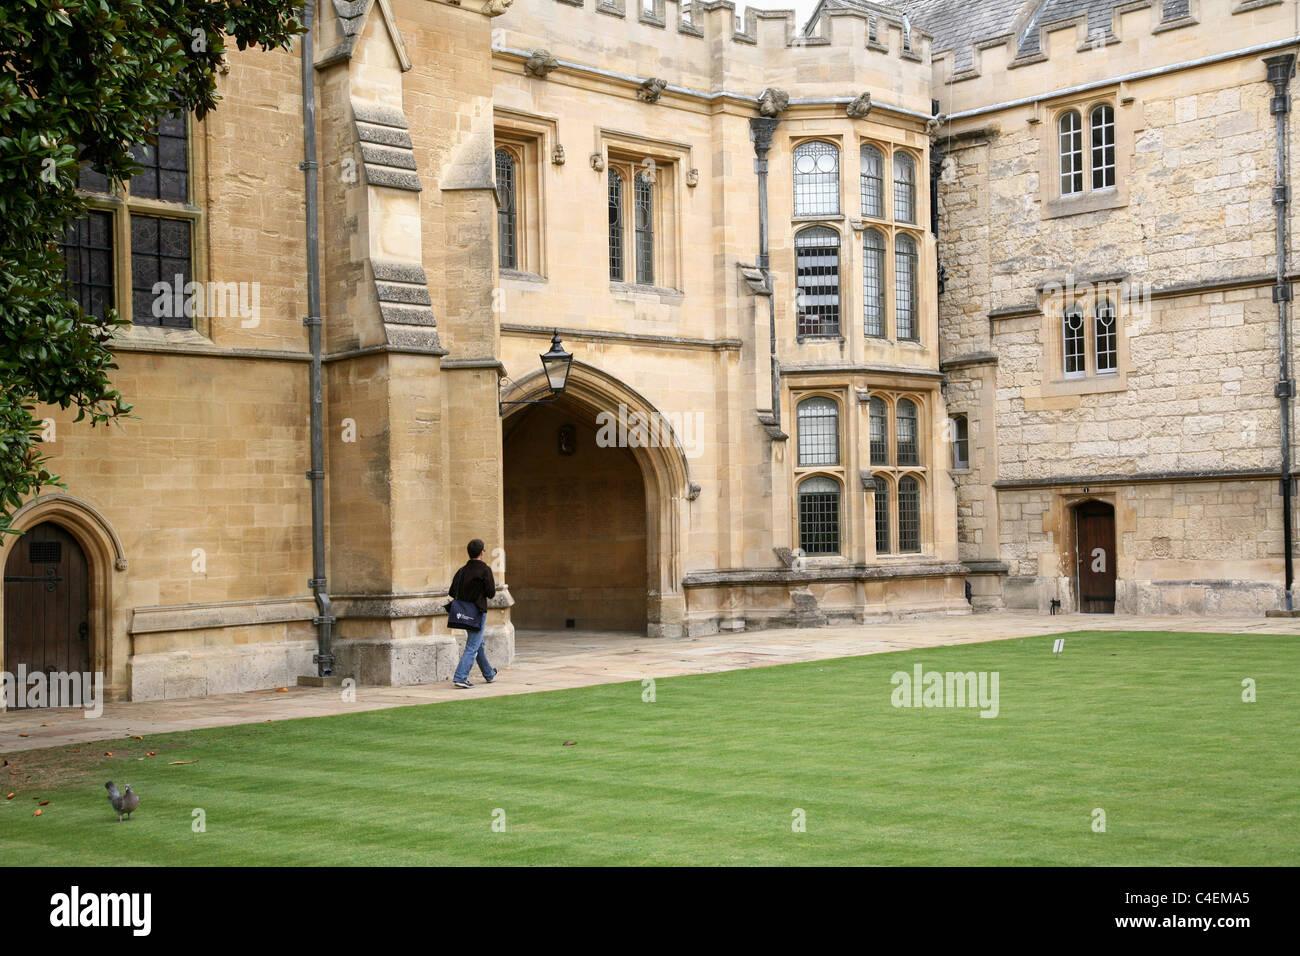 Oxford University, Merton College Fellows' Quad - Stock Image